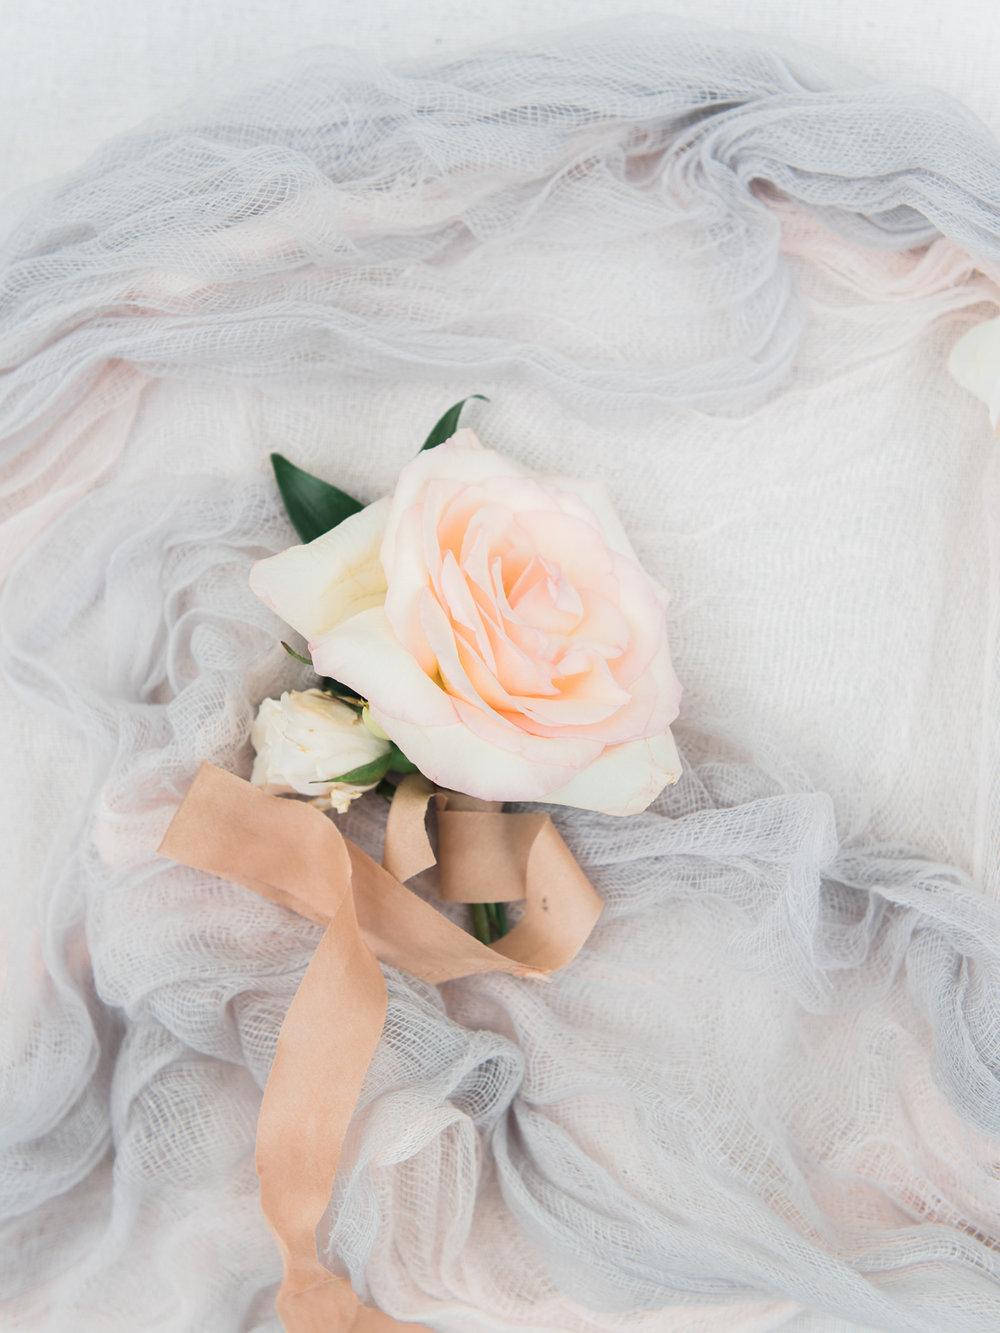 christinadavisphotography-romanticwedding-gardenweddinginspiration73.jpg